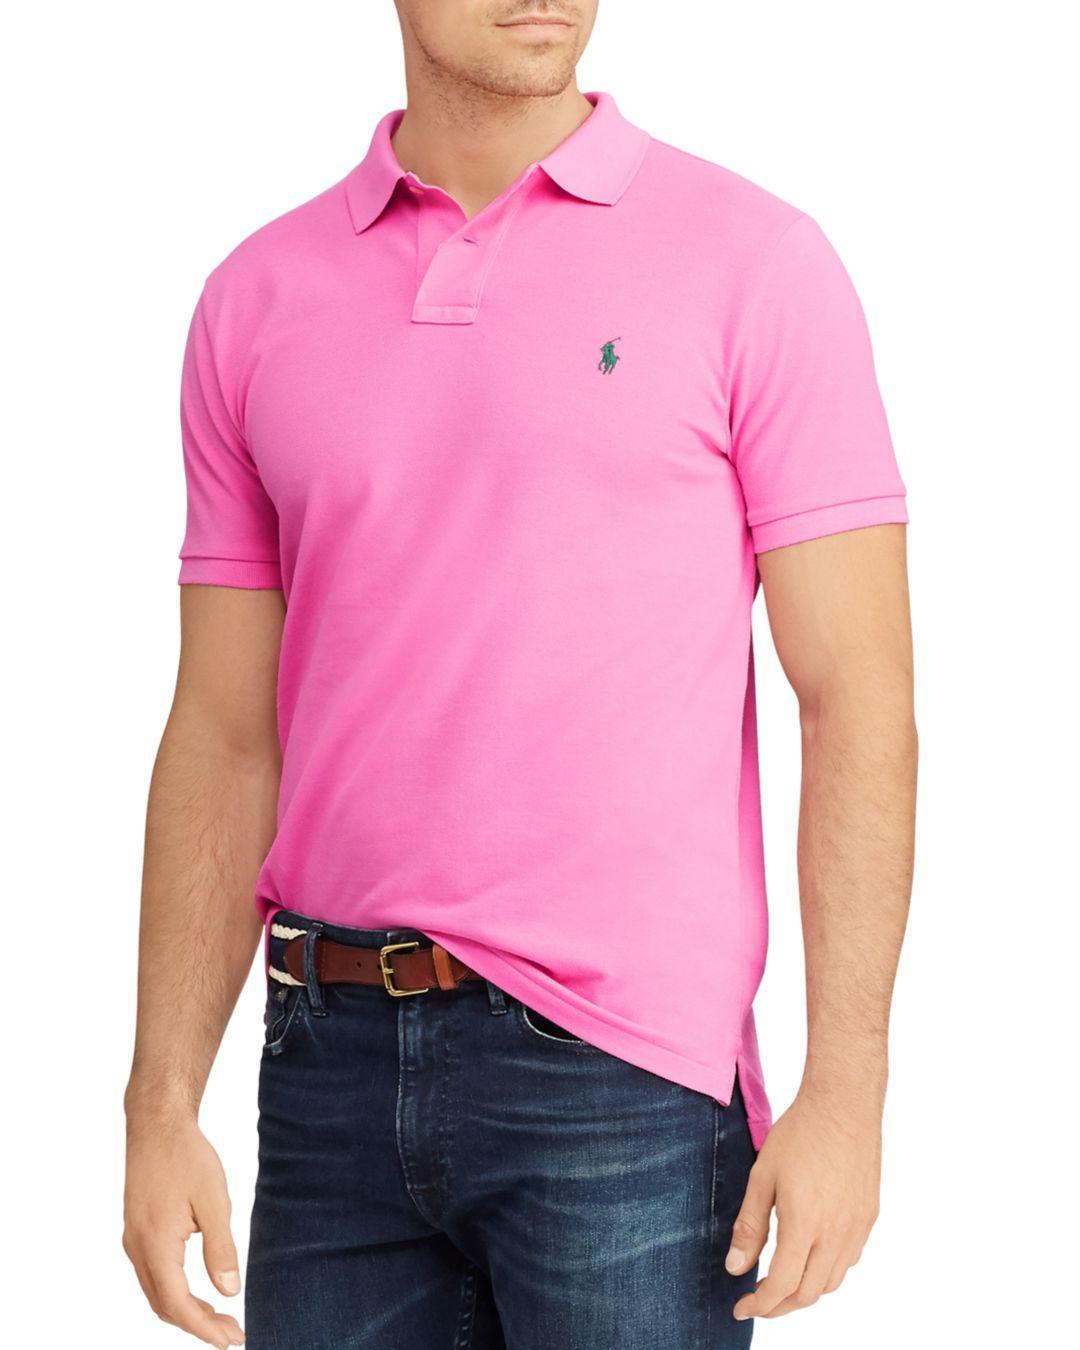 0821a5ee Polo Ralph Lauren. Men's Pink Custom Slim Fit Mesh Short Sleeve Polo Shirt